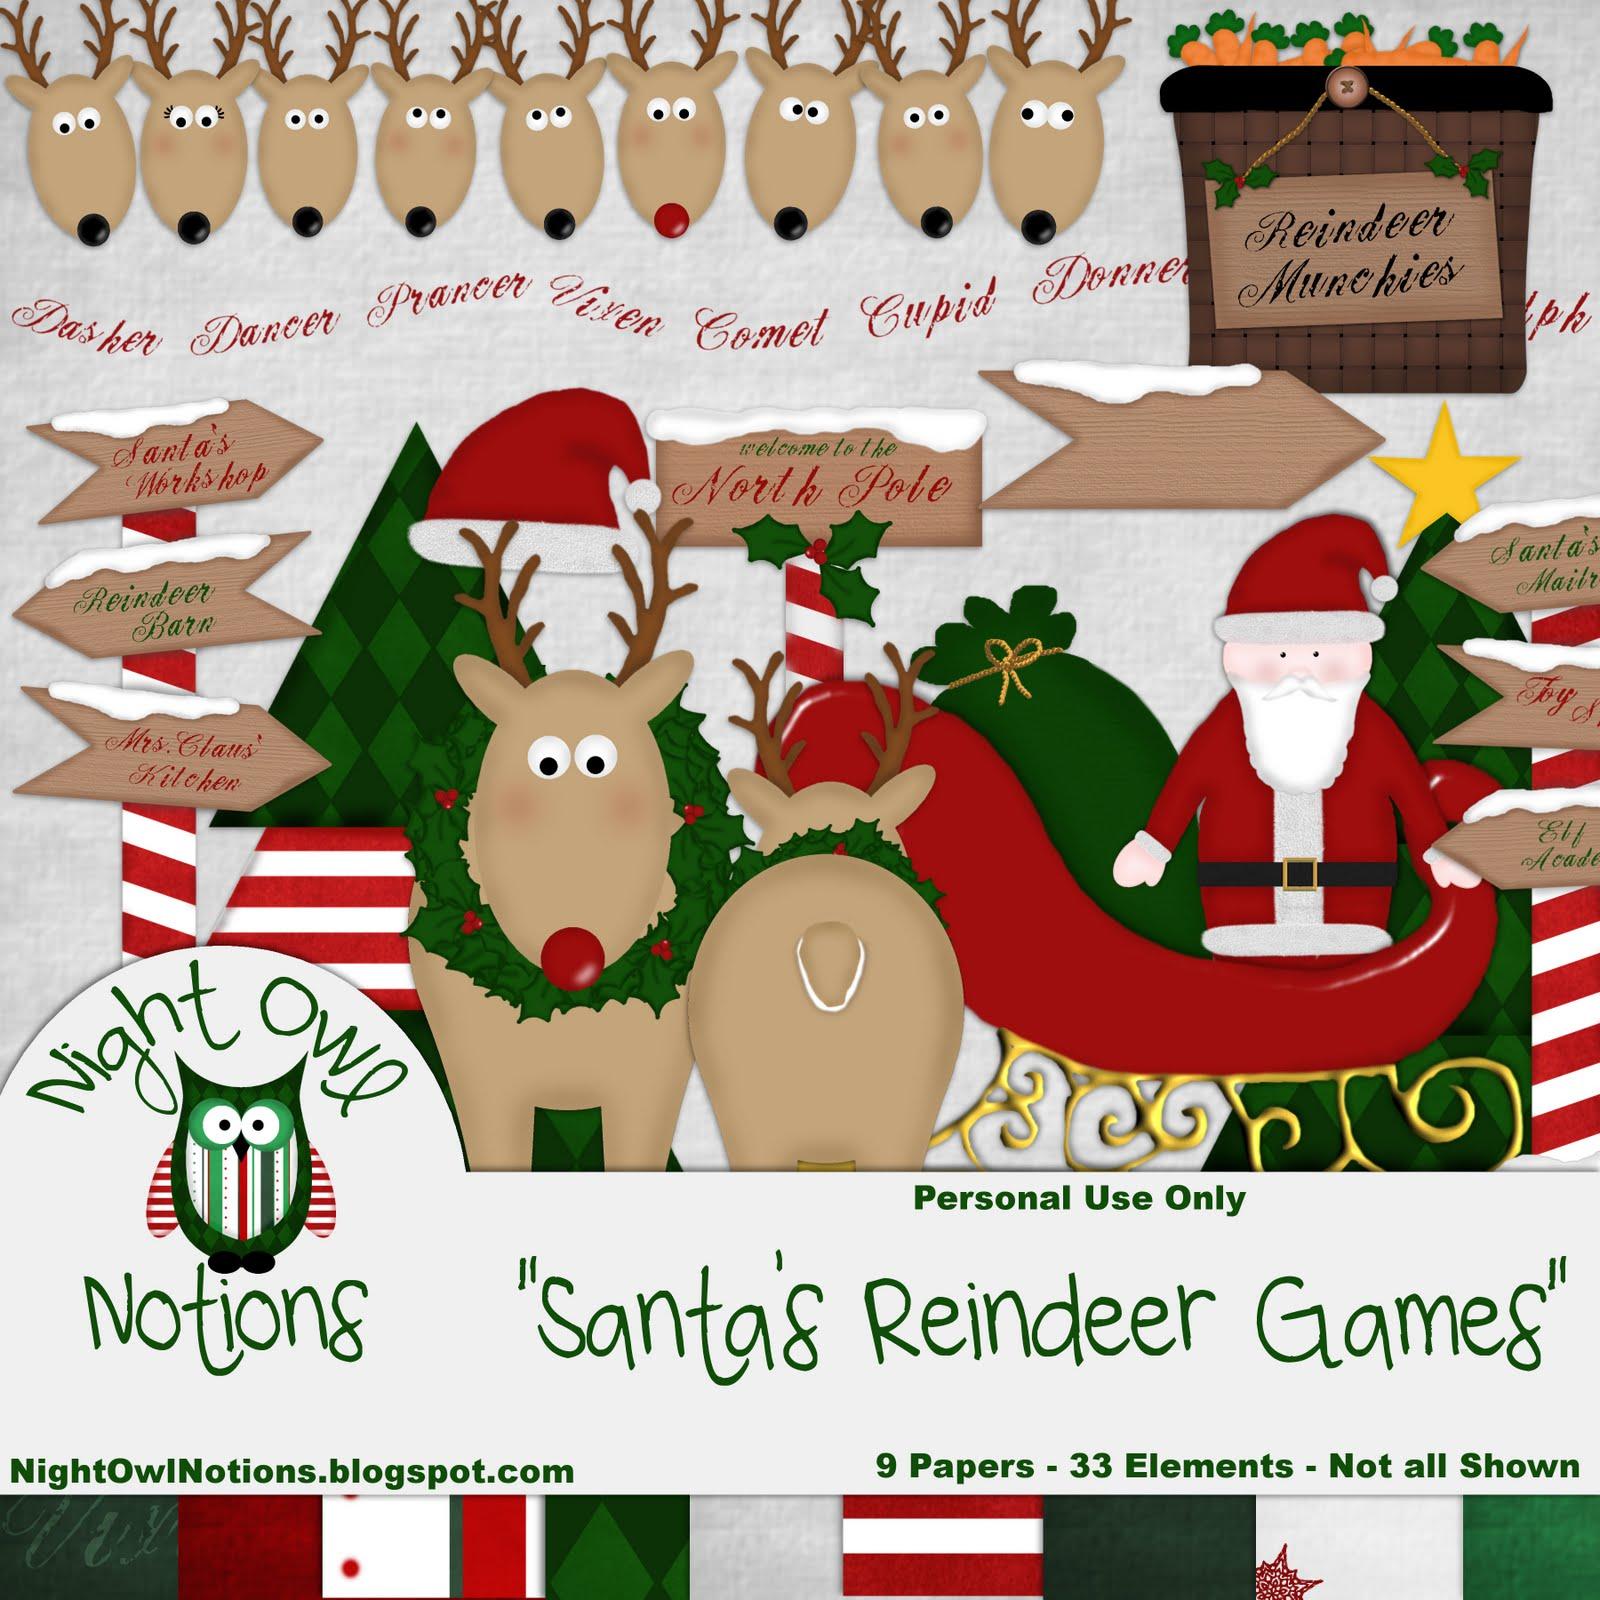 Santa's reindeer's names Images & Pictures - Findpik